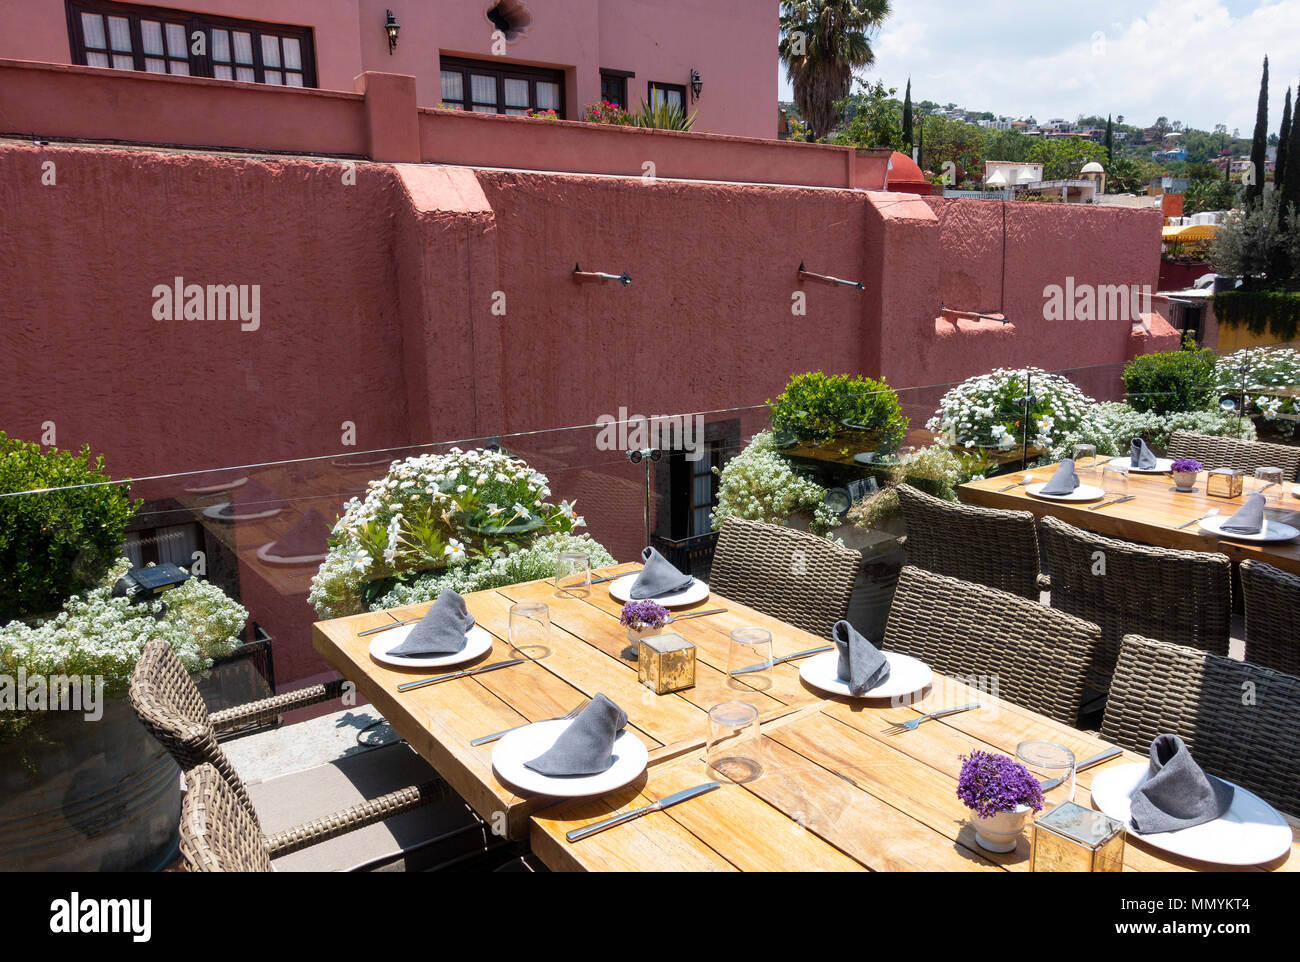 Mesas De La Terraza Para Almorzar En Un Restaurante De